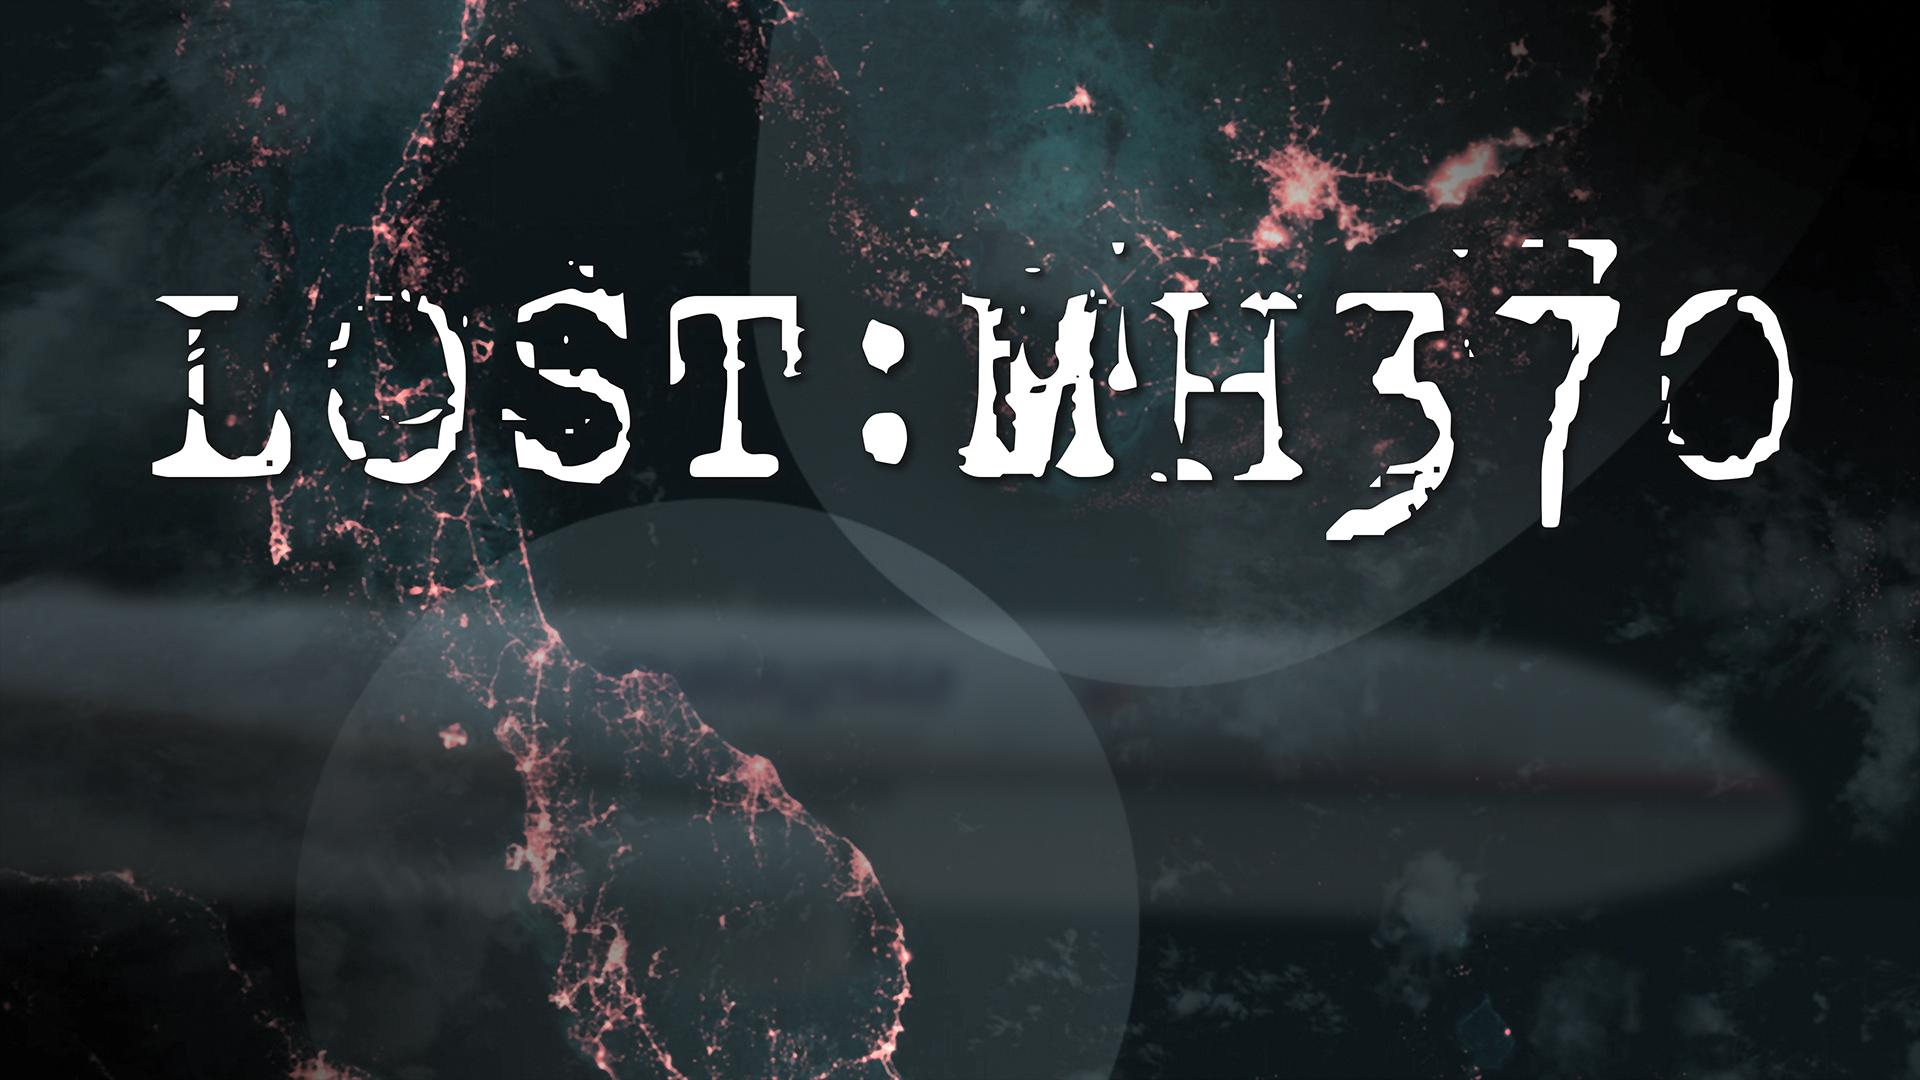 Lost: MH370